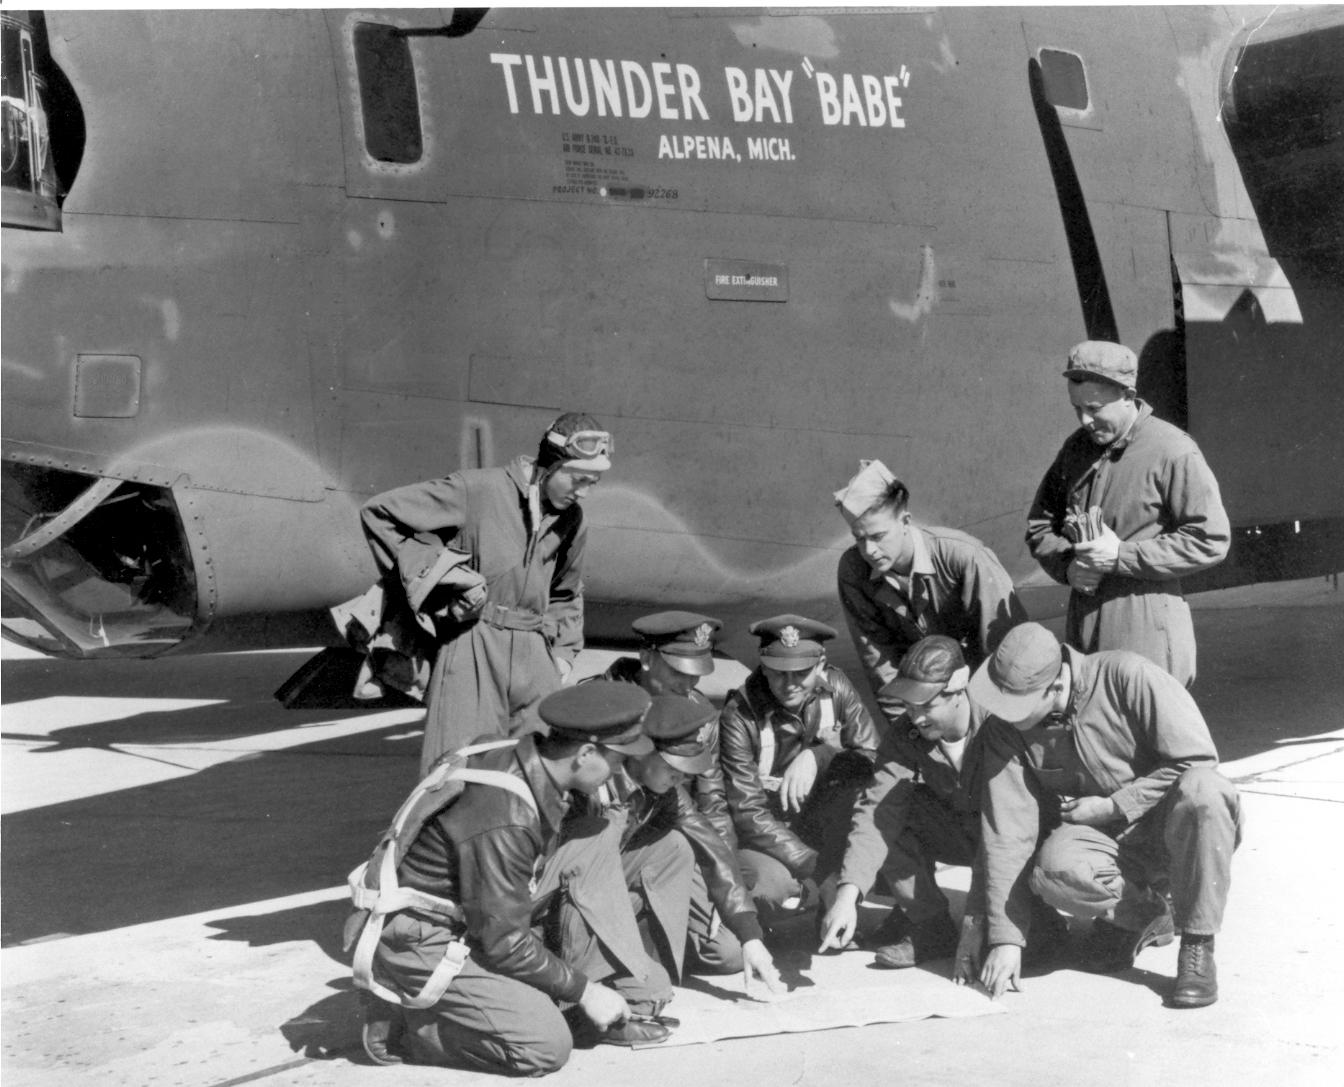 Thunder Bay Babe